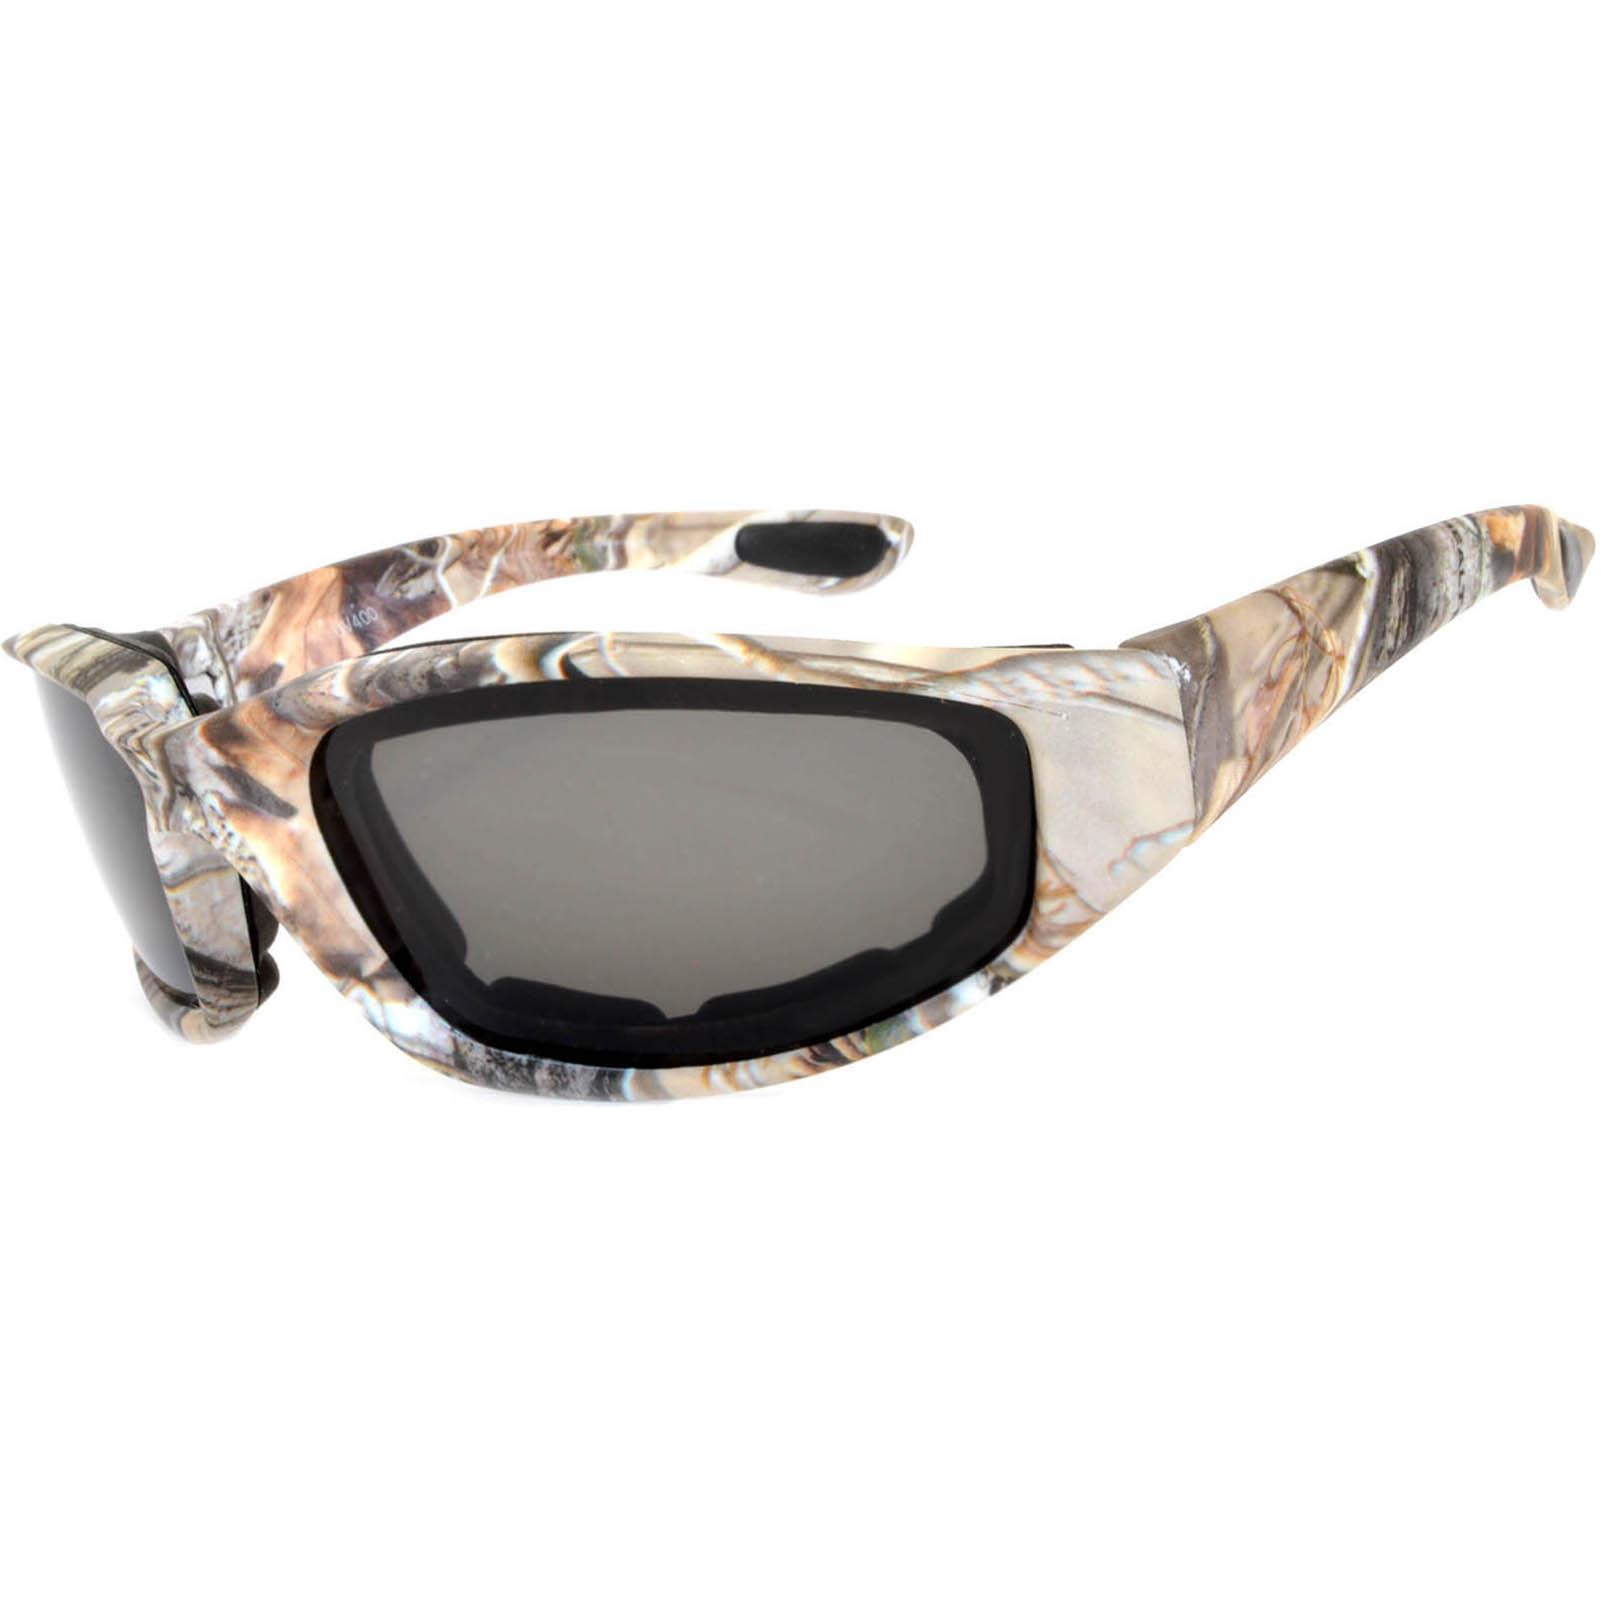 OWL Eyewear Motorcycle Padded Glasses Camo#2 Frame Smoke Lens (One ...